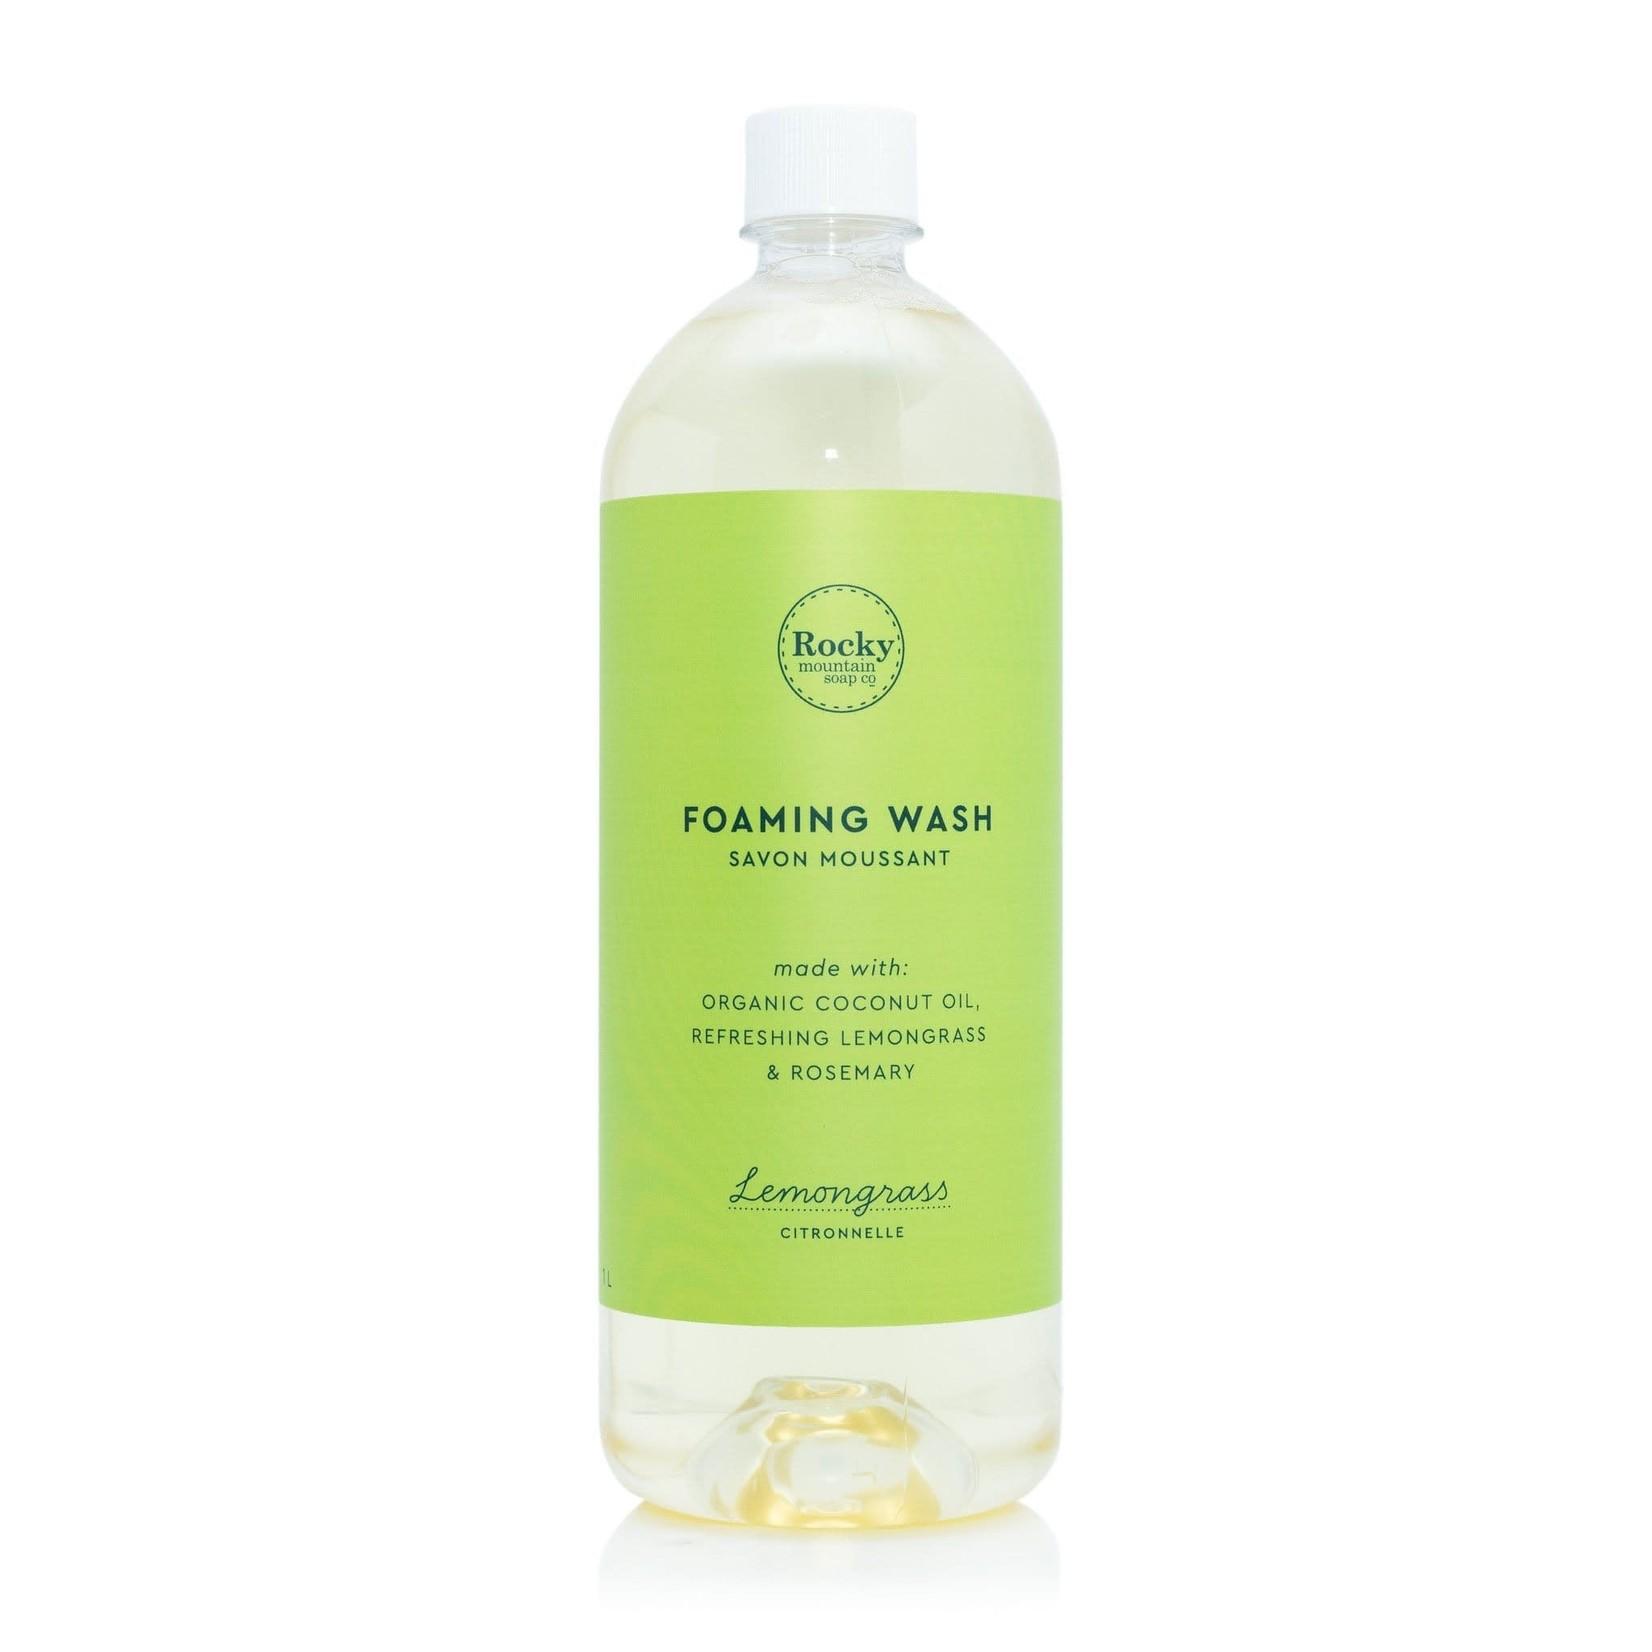 ROCKY MOUNTAIN SOAP CO. FOAMING WASH - LEMONGRASS